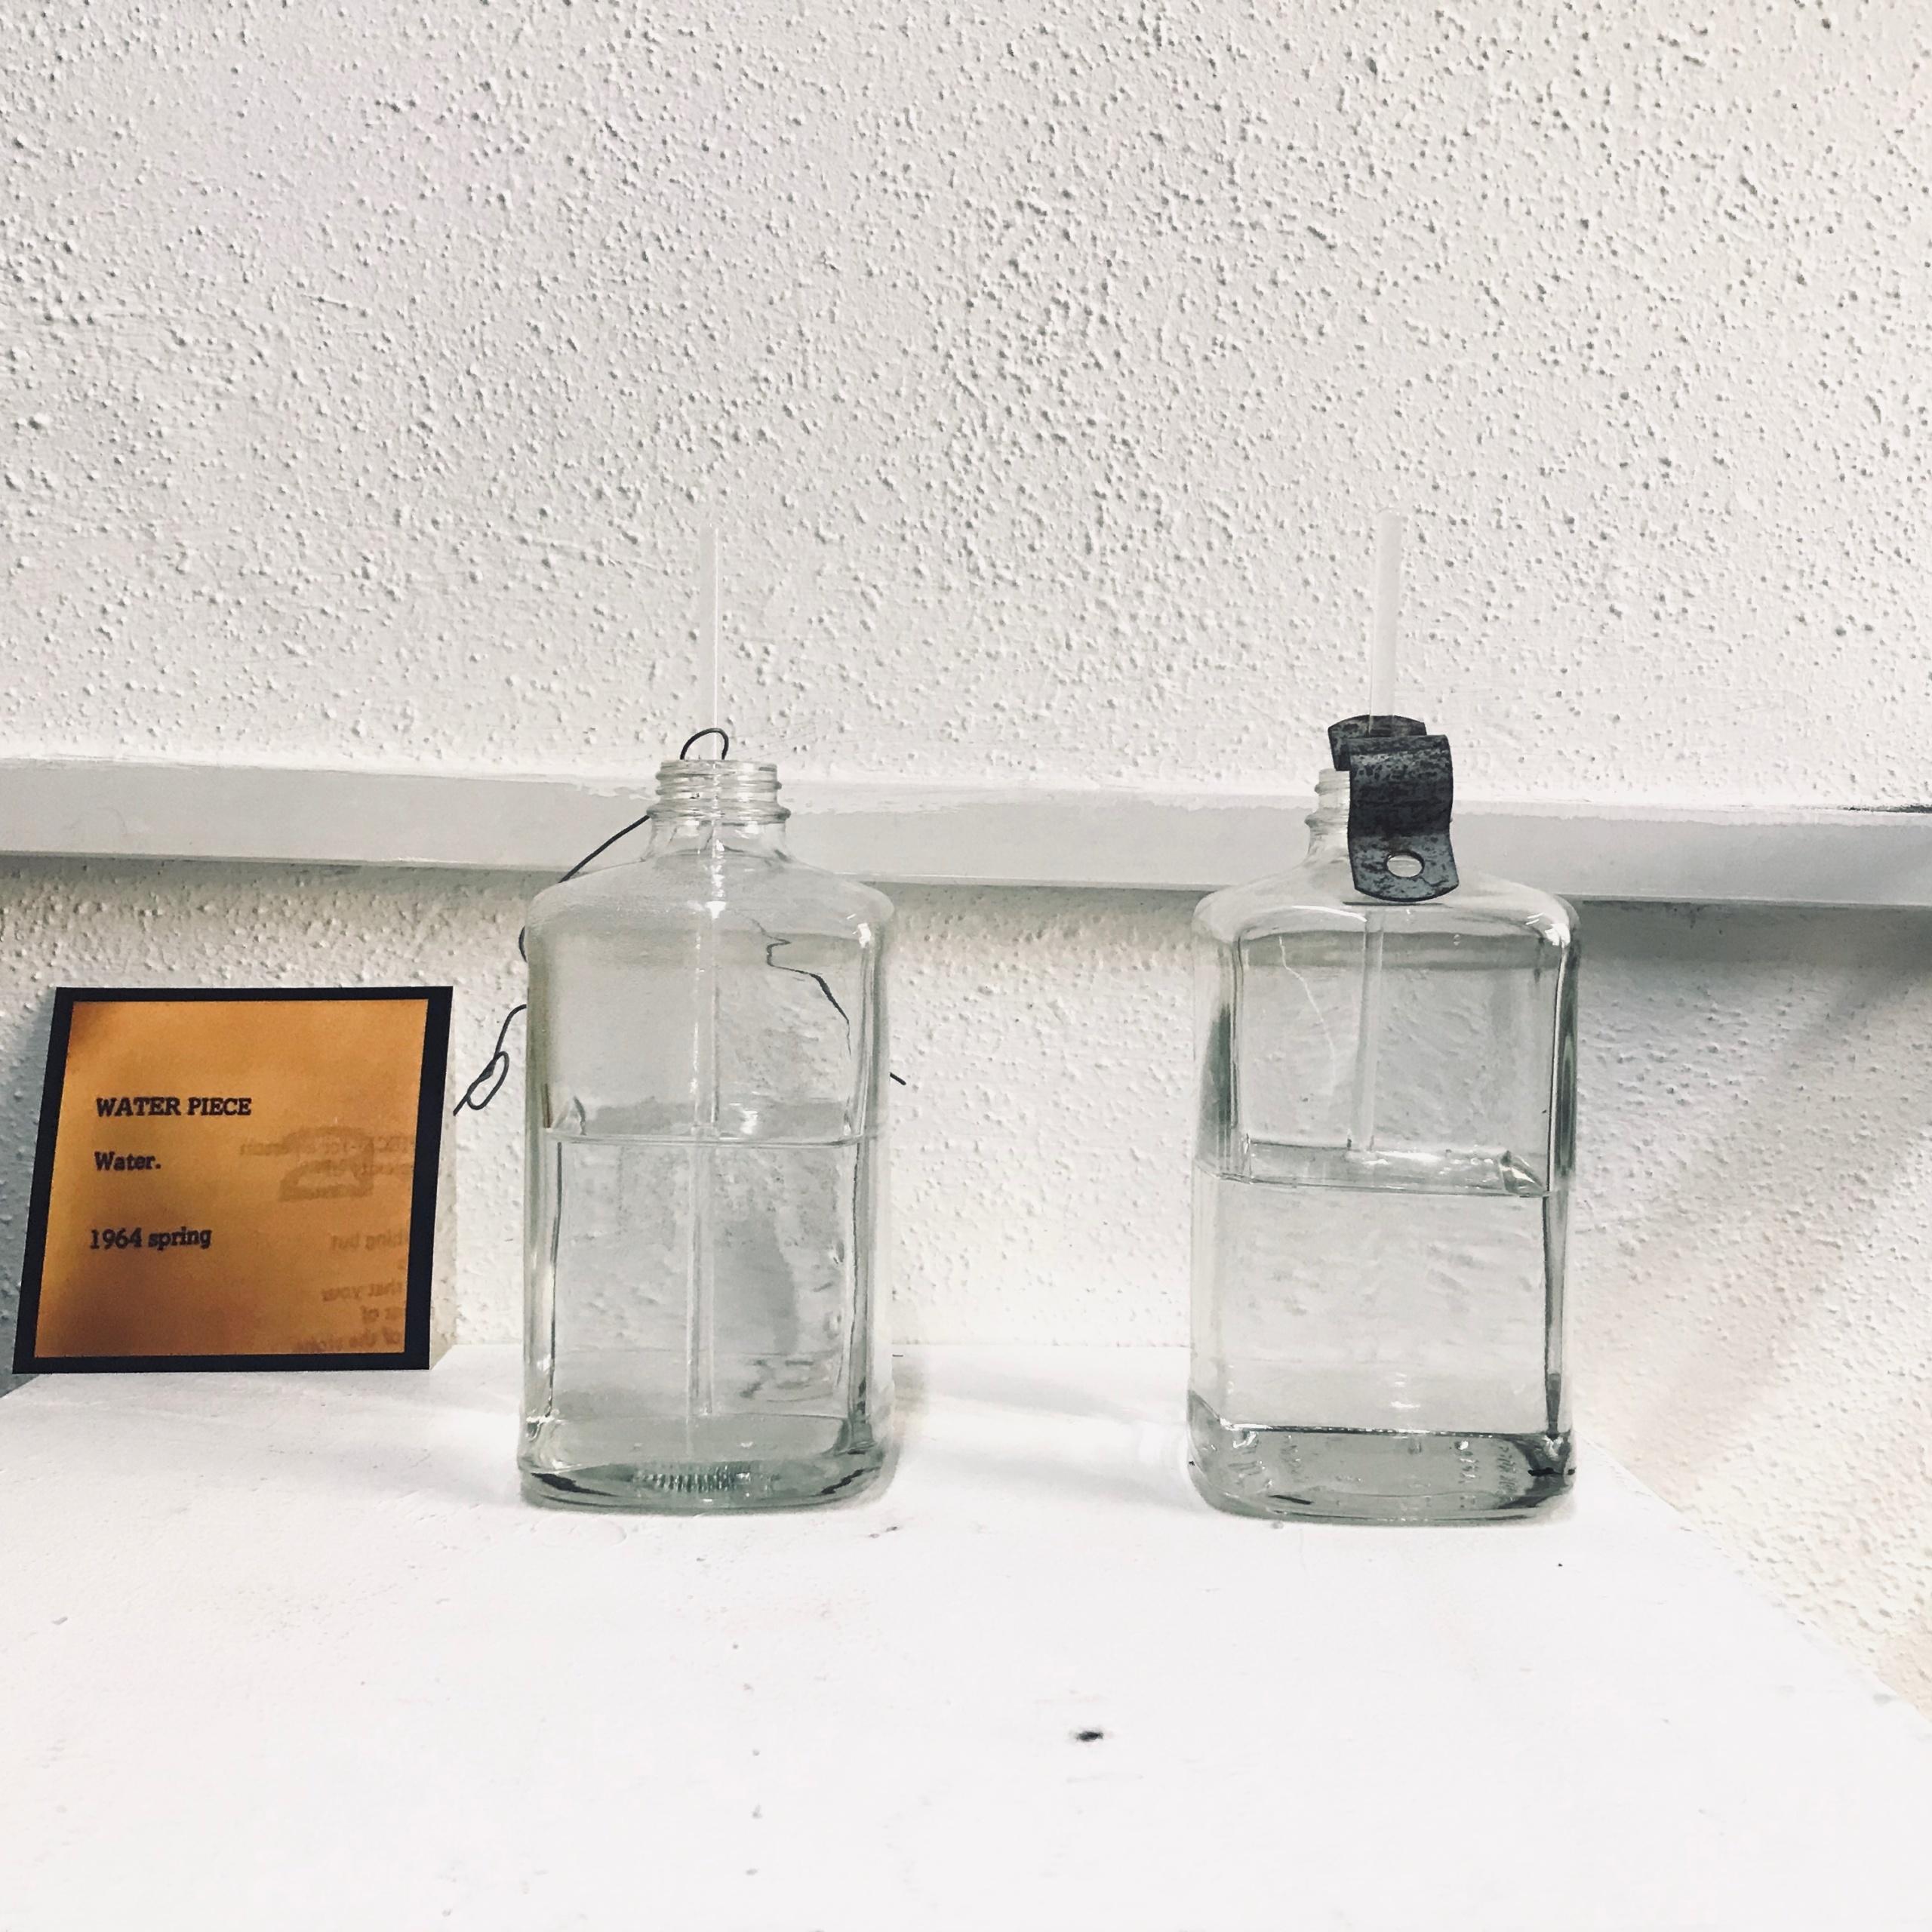 Yoko Ono's Grapefruit – a realisation of 'water piece' (1964) @ HCMF 2019, TemporaryContemporary, Huddersfield